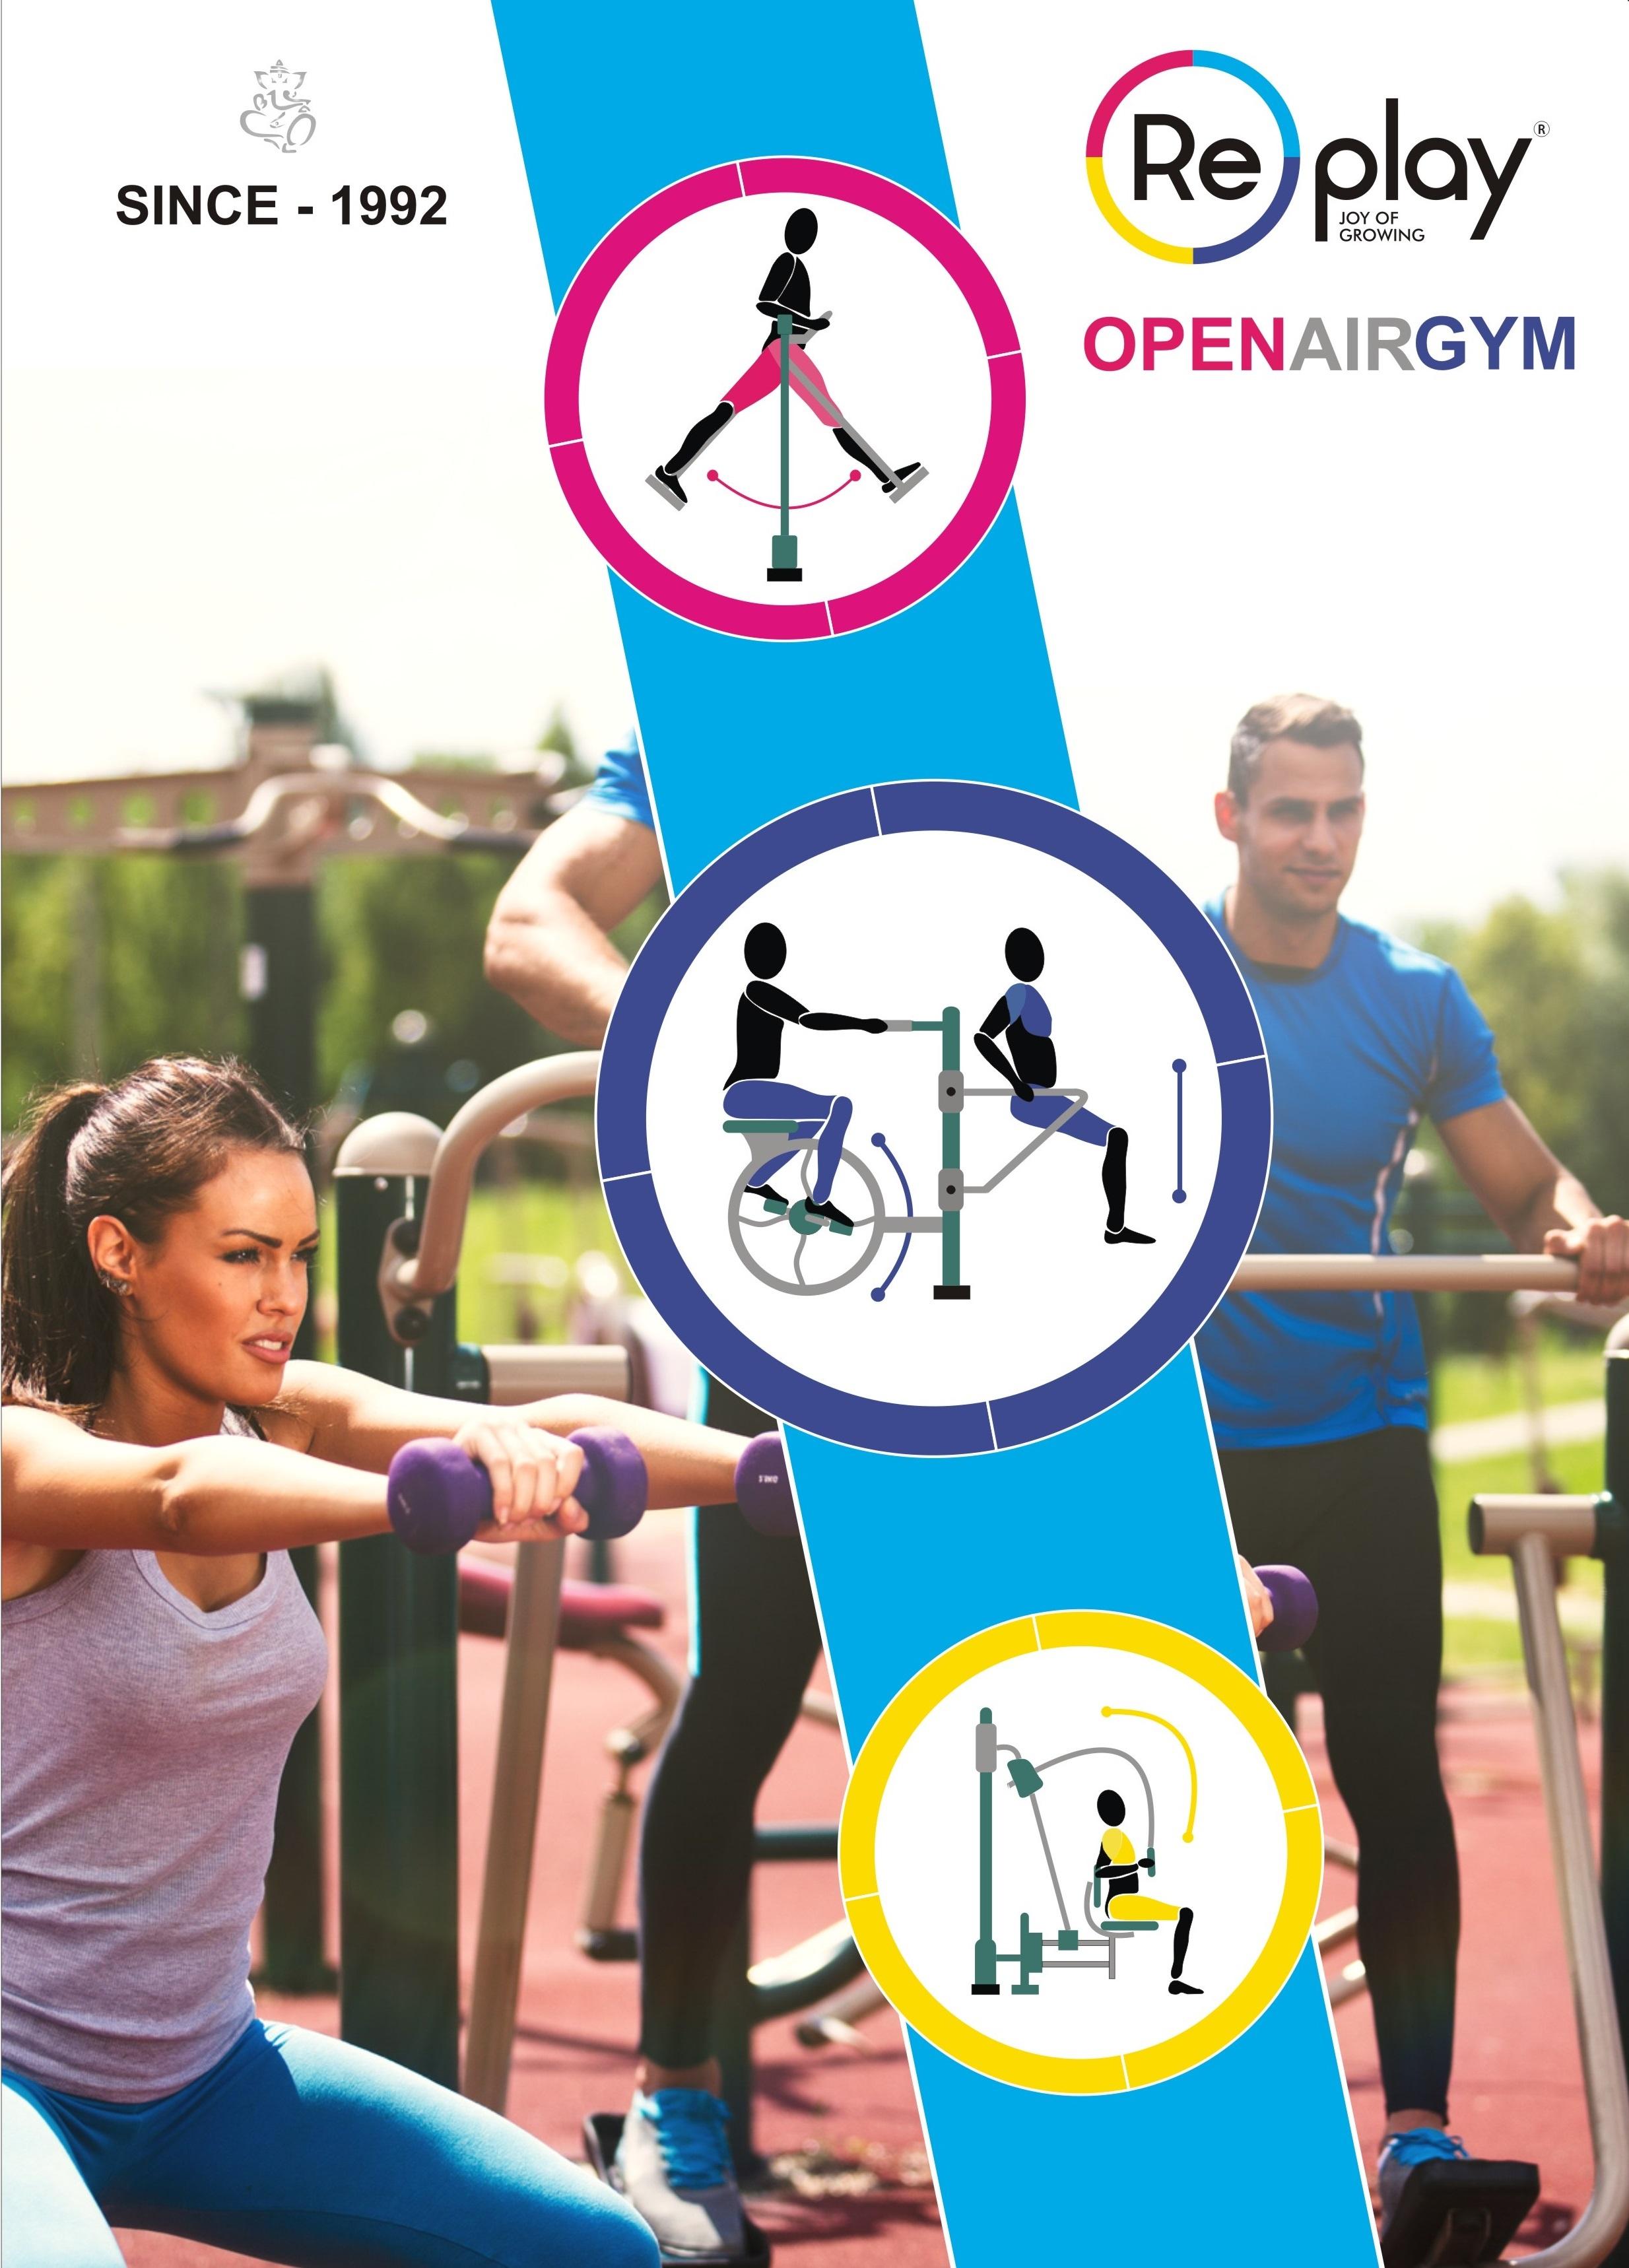 multi-generational outdoor gym